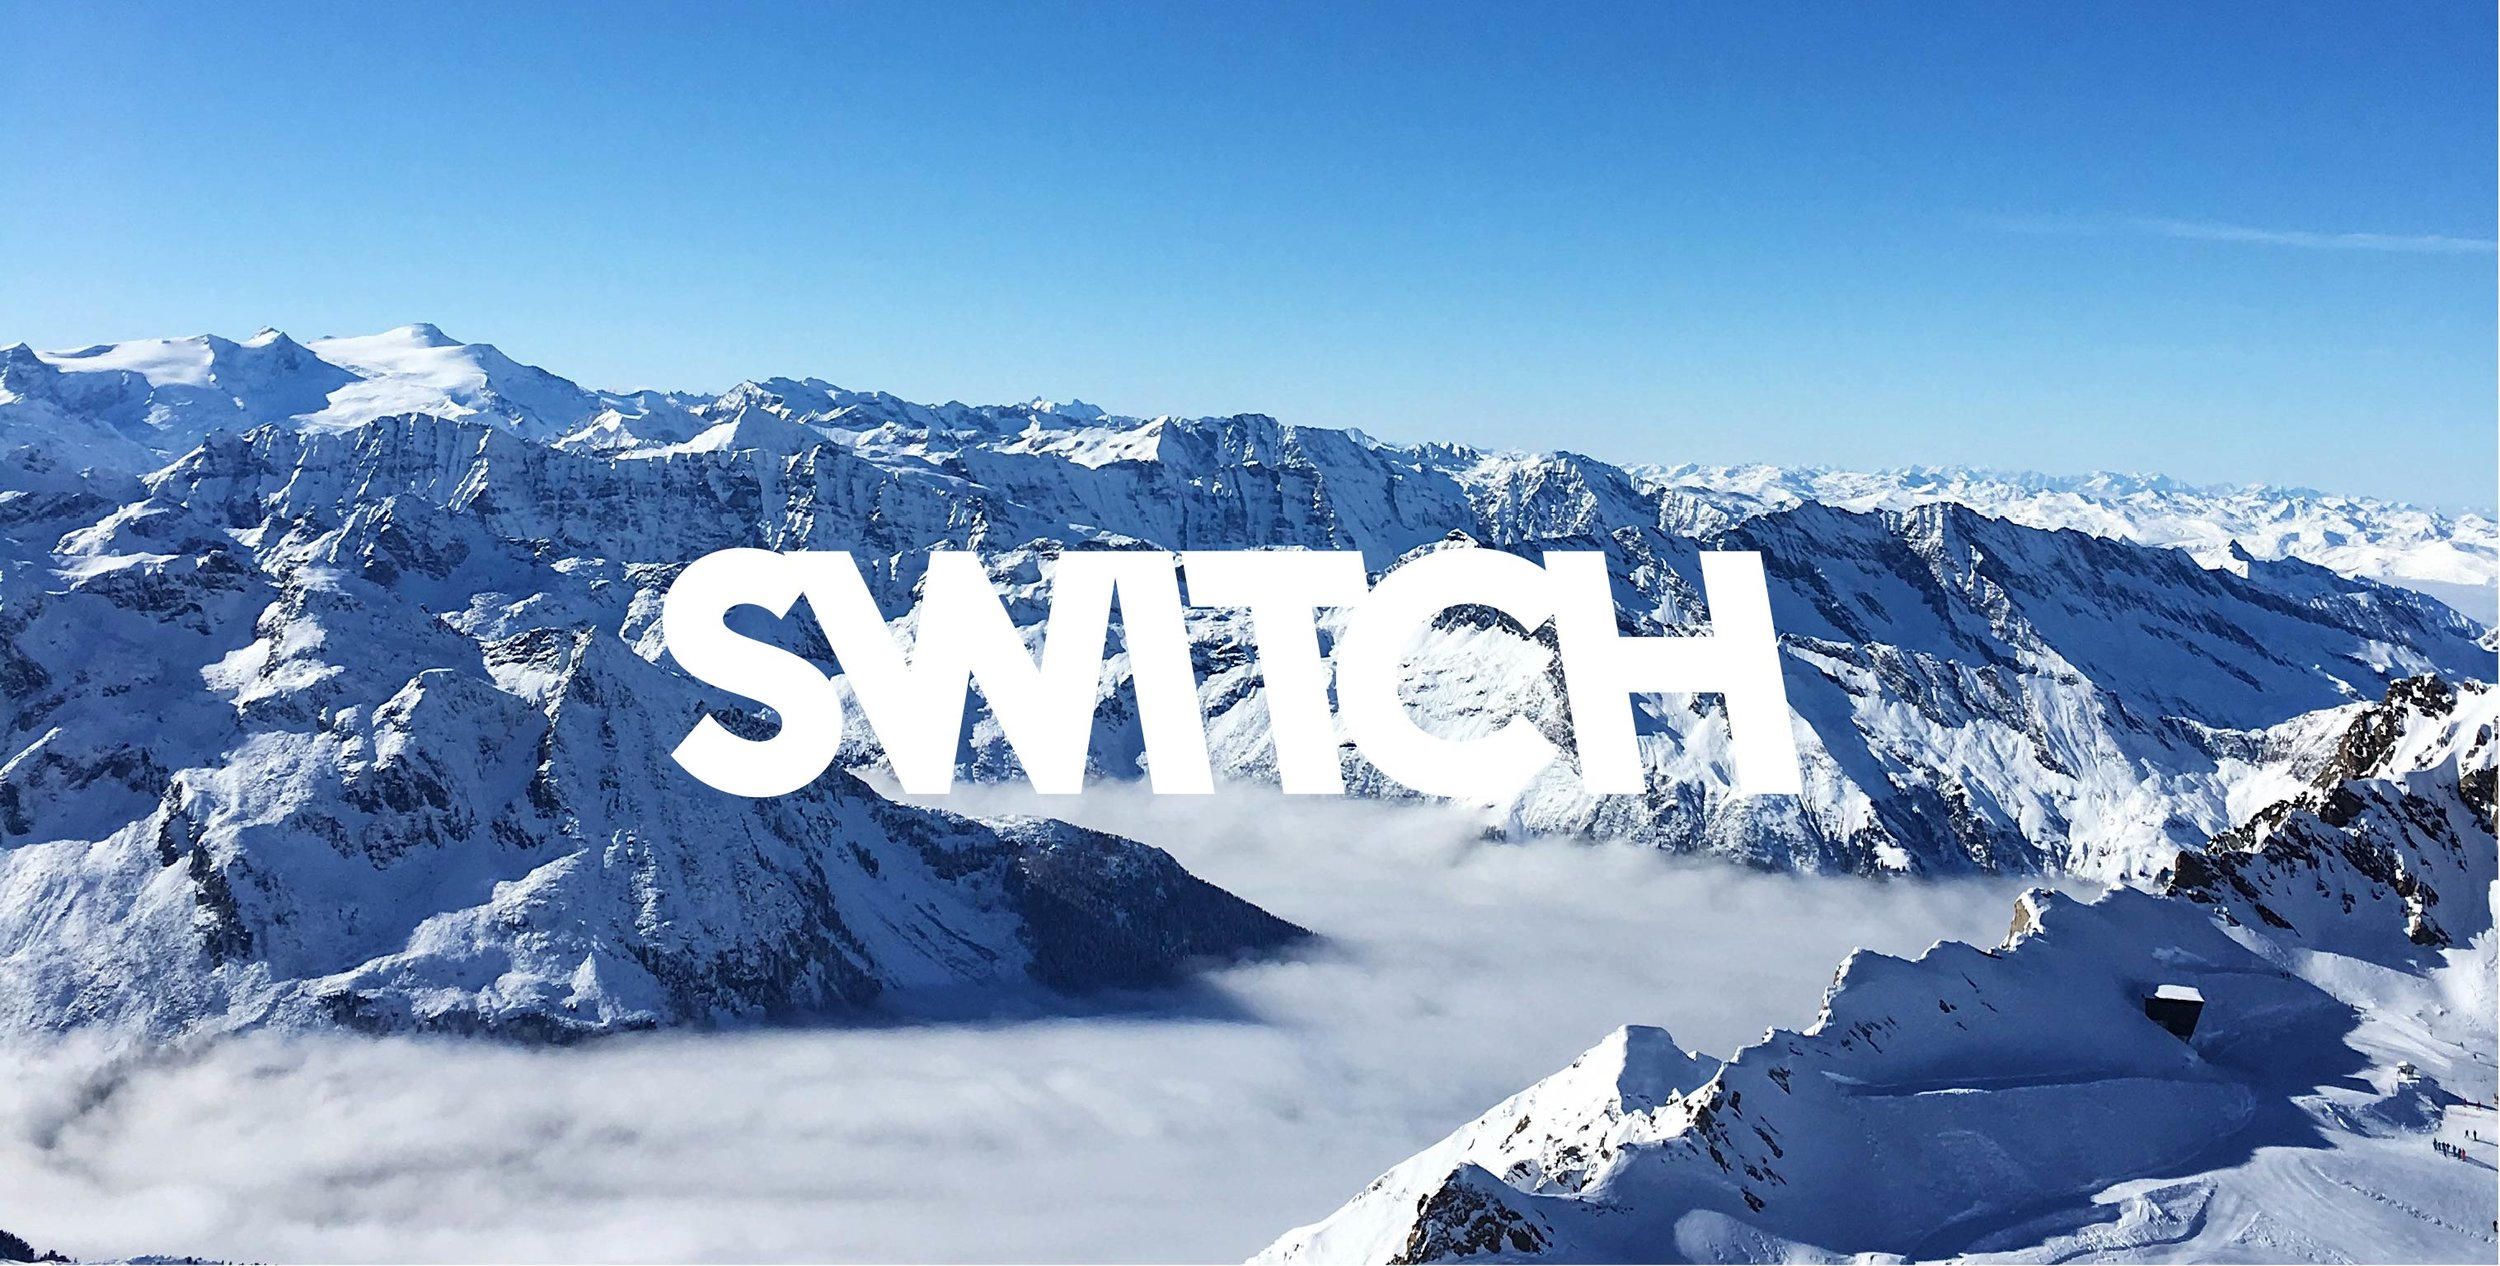 switch6.jpg